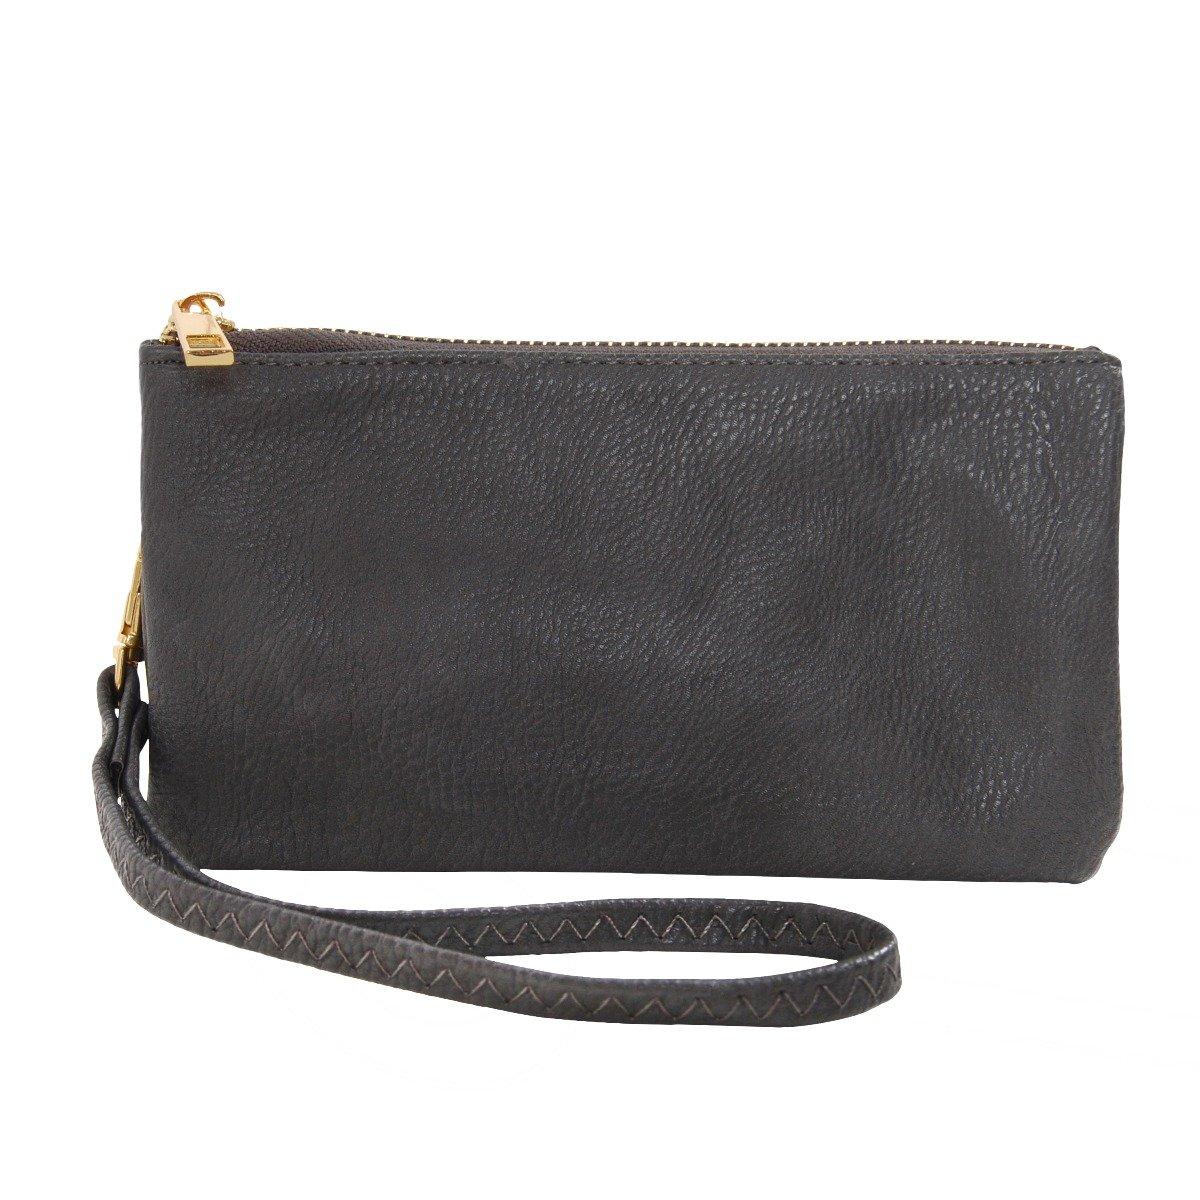 Humble Chic Vegan Leather Wristlet Wallet Clutch Bag - Small Phone Purse Handbag, Charcoal Grey, Dark Gray by Humble Chic NY